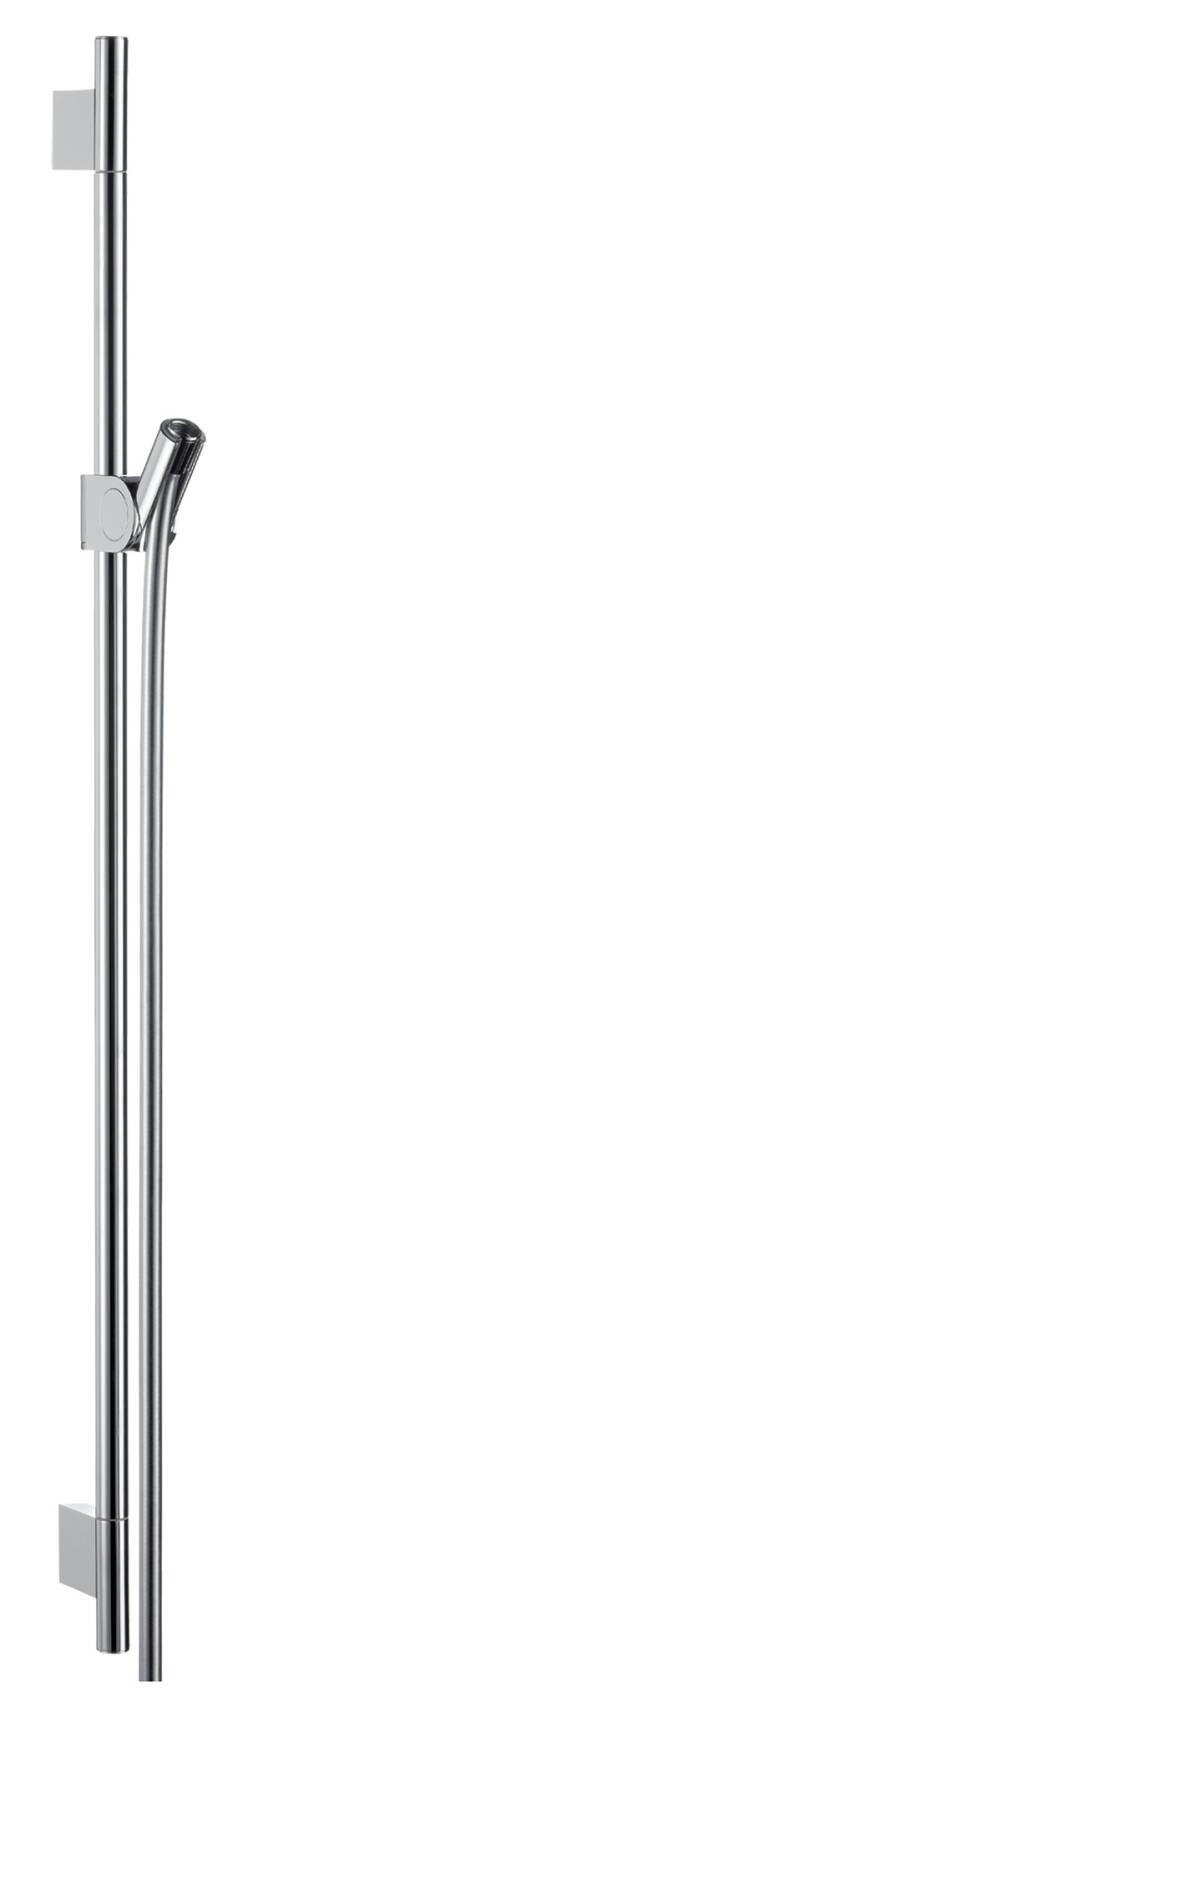 Shower bar 0.90 m, Chrome, 27989000